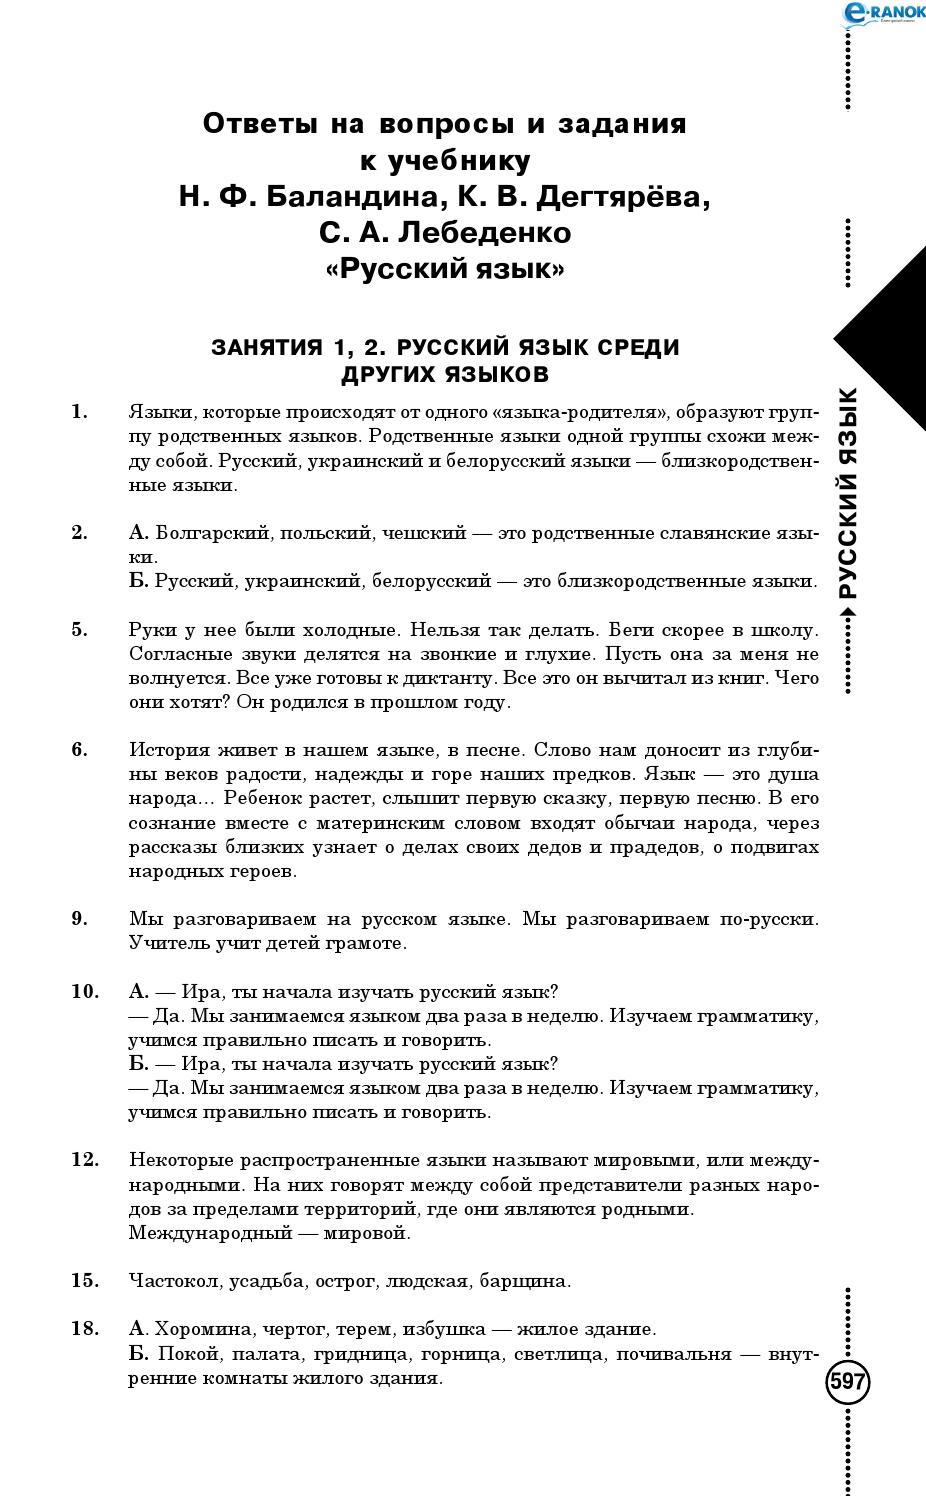 Гдз 8 класс русский язык н ф баландина